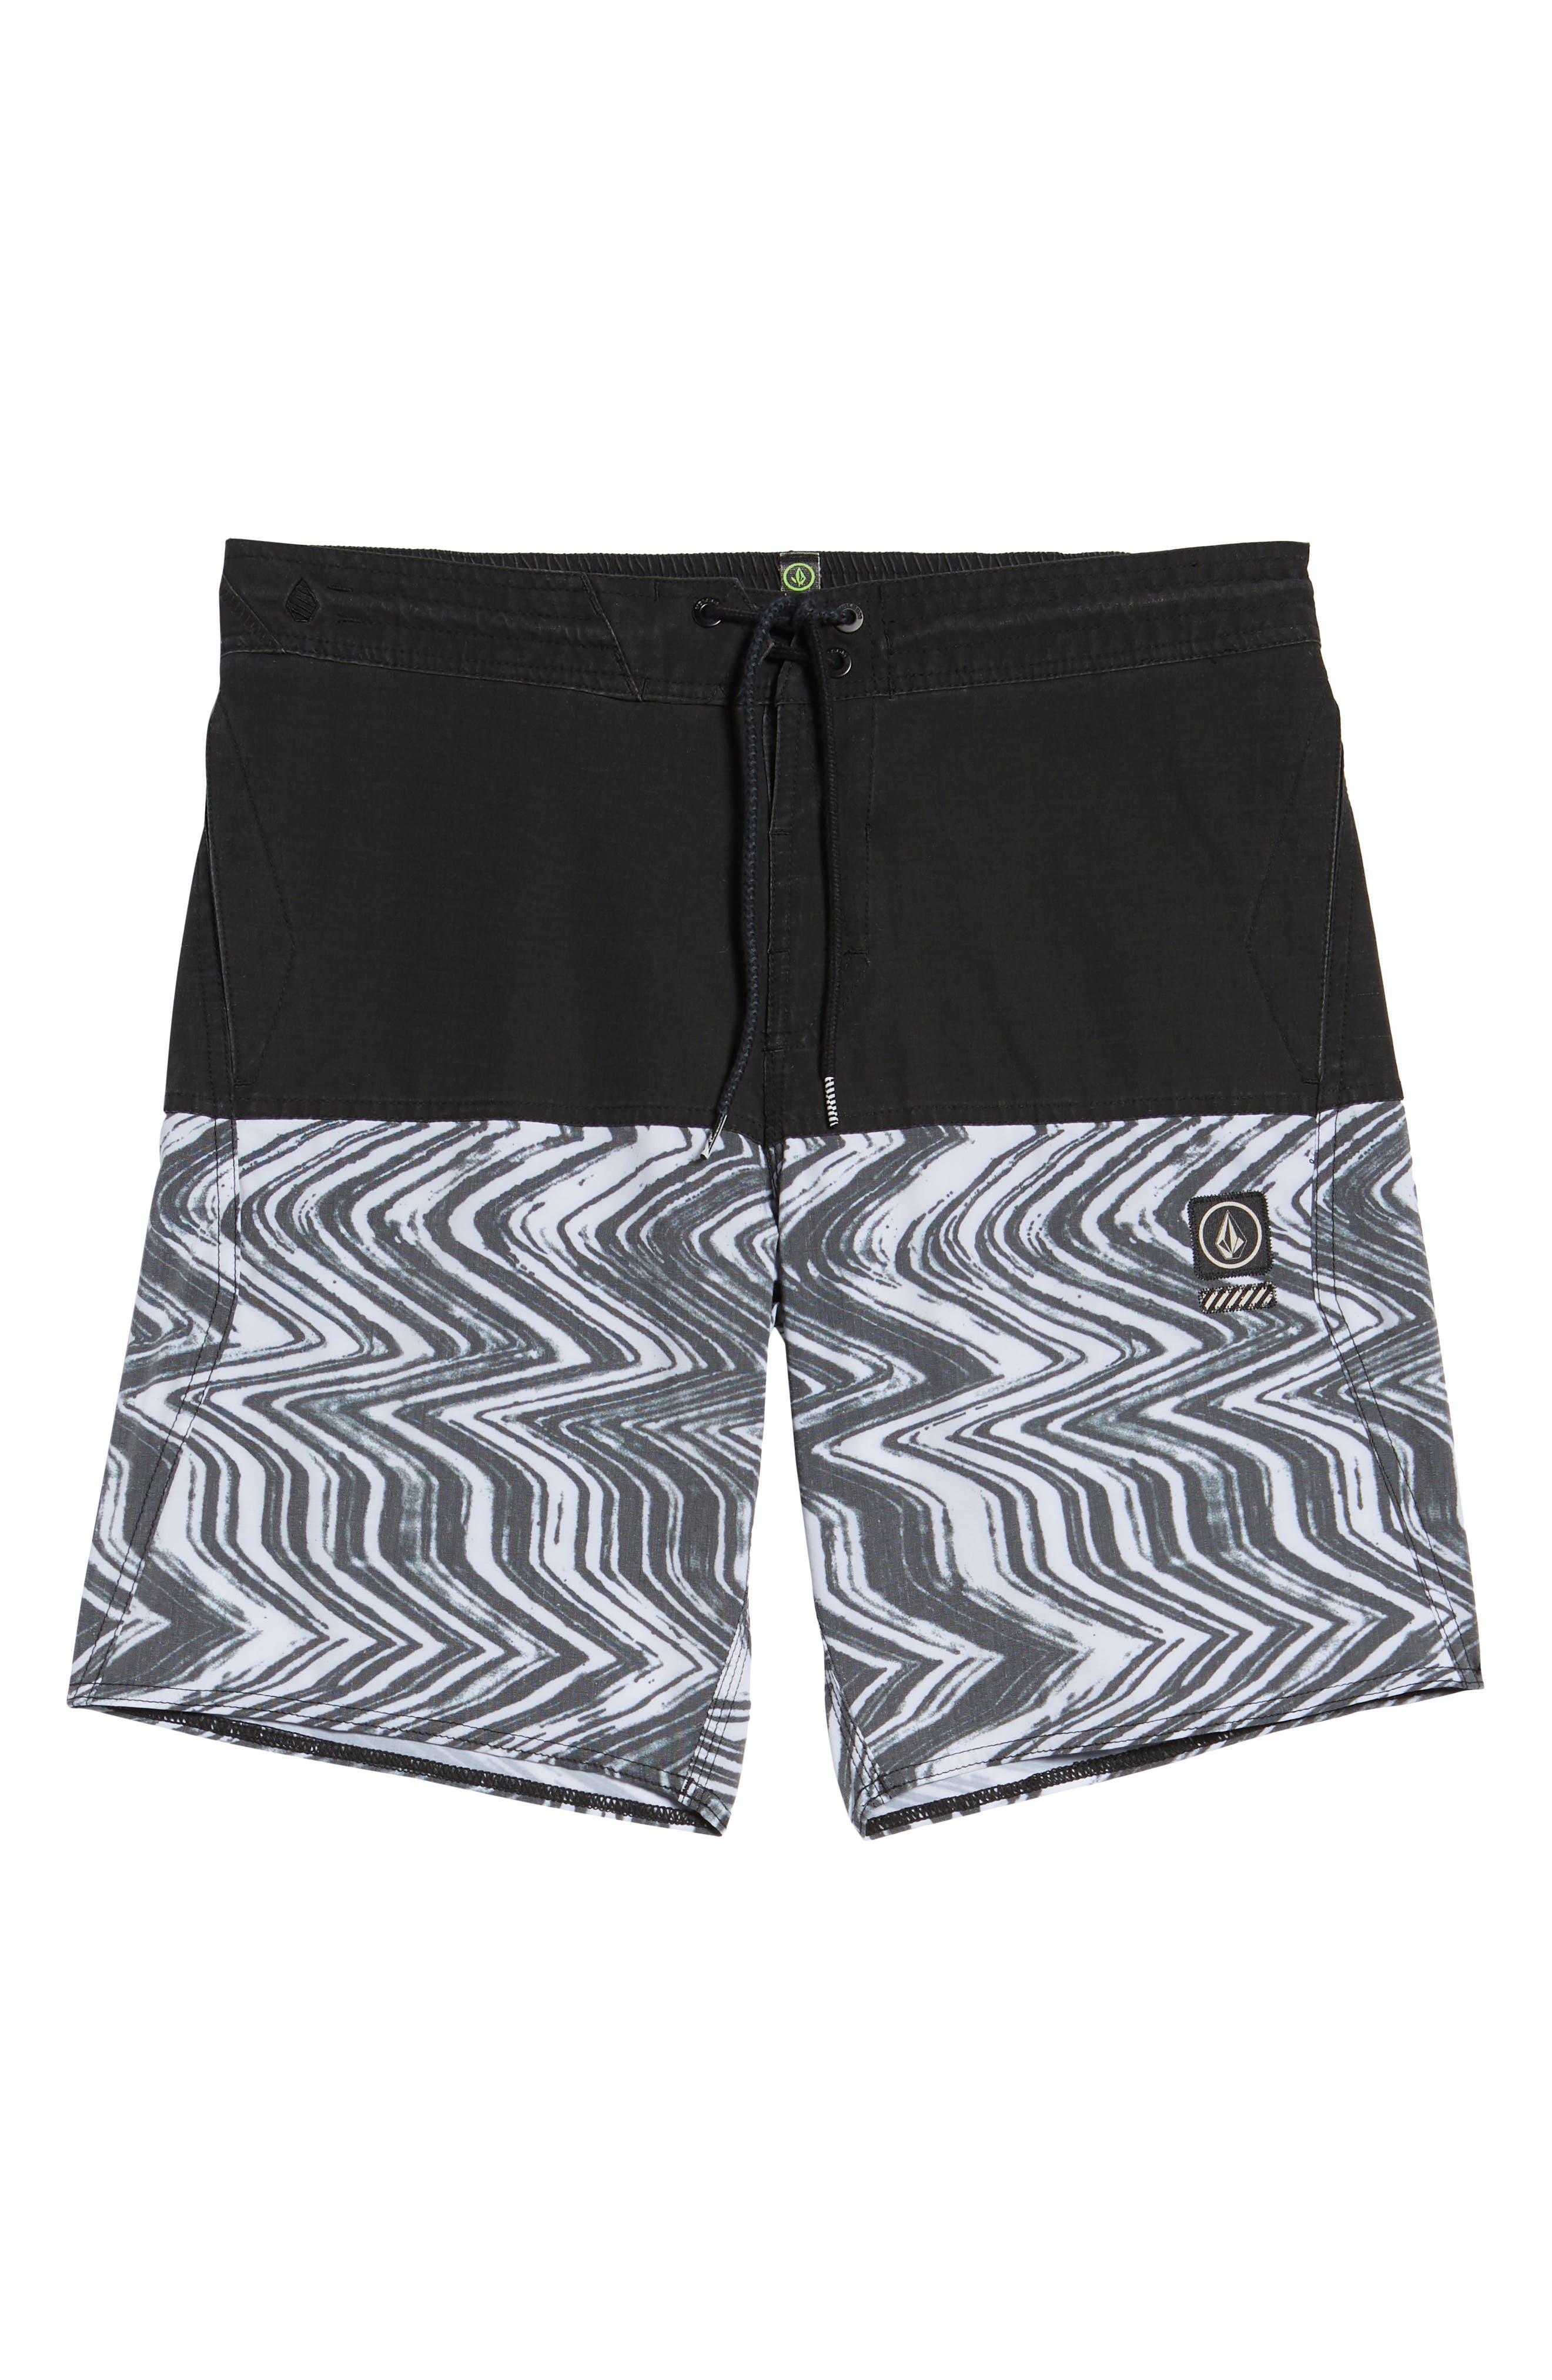 Vibes Half Stoney Board Shorts,                             Alternate thumbnail 6, color,                             Black